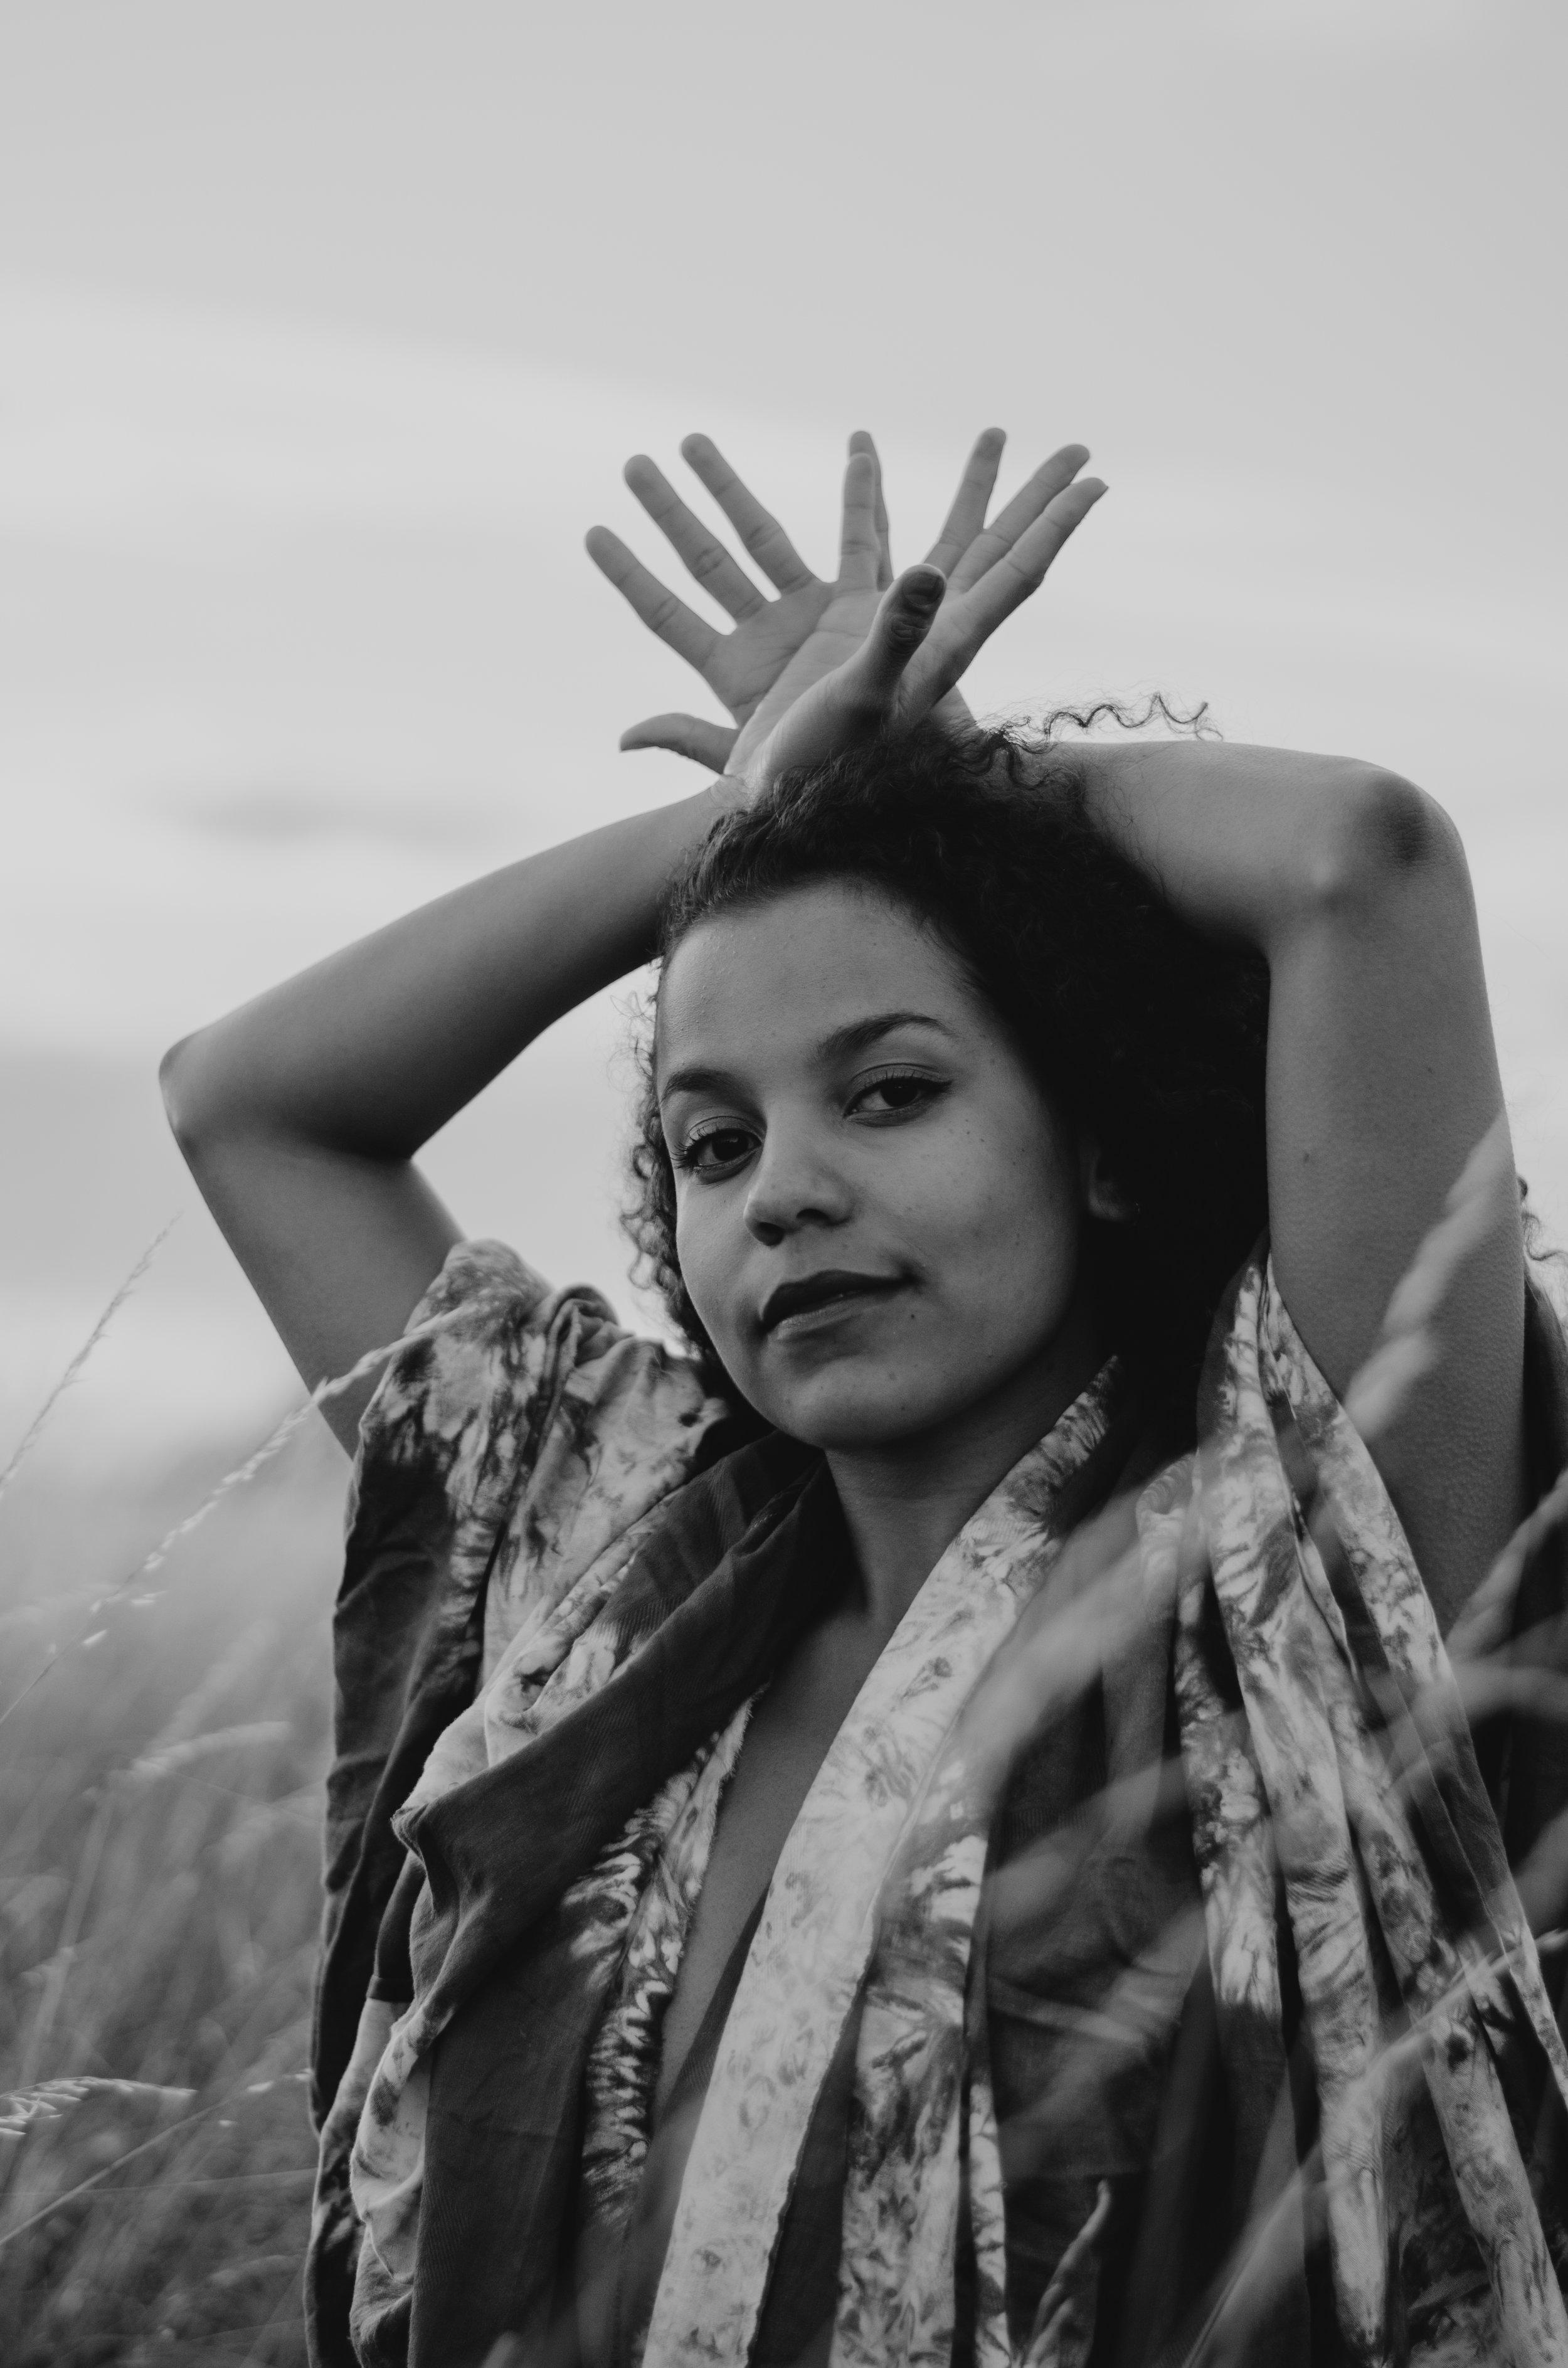 Inka-Portrait-Session-Aiste-Saulyte-Photography-17-07-30-517.jpg